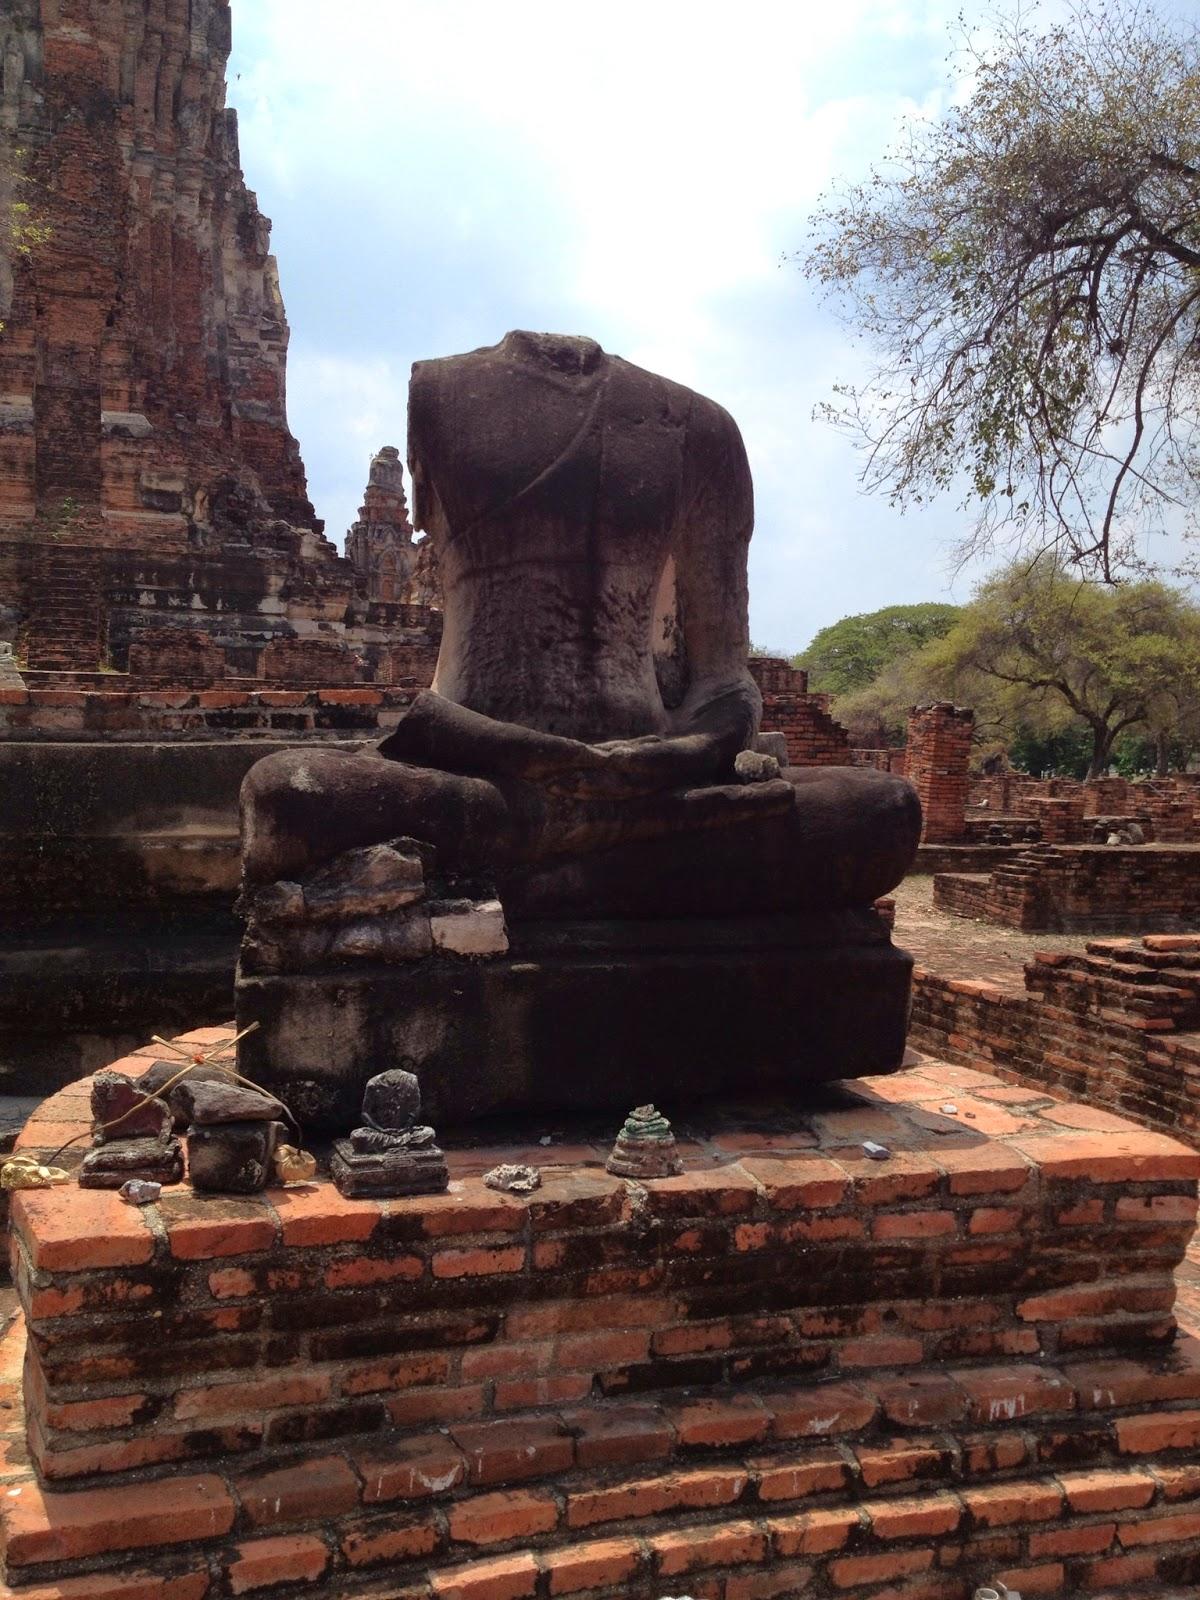 Ayutthaya - Beheaded Buddha statue at Wat Phra Ram